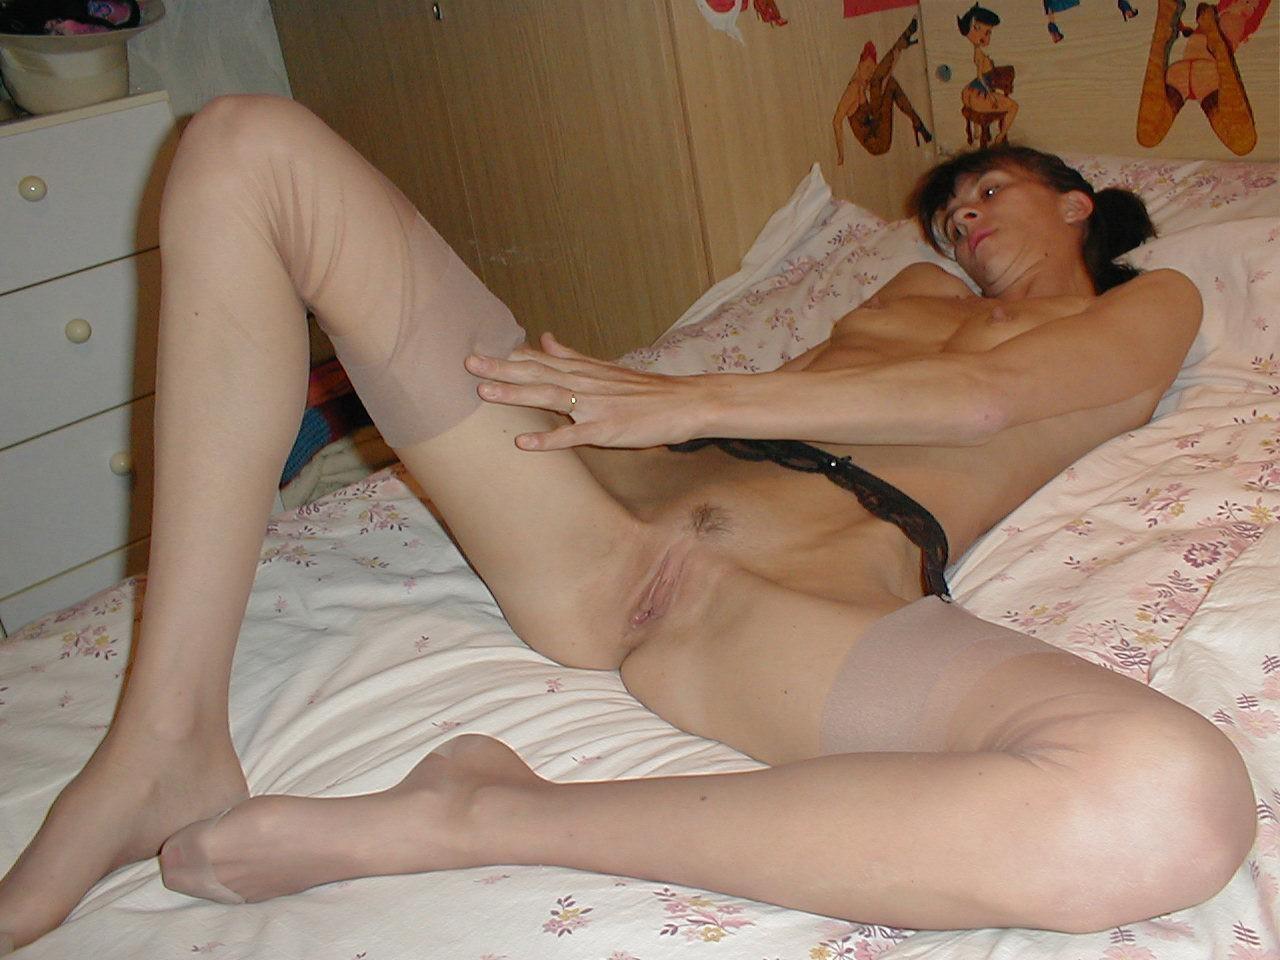 http://pbs-2.adult-empire.com/85/8570/022/pic/5.jpg